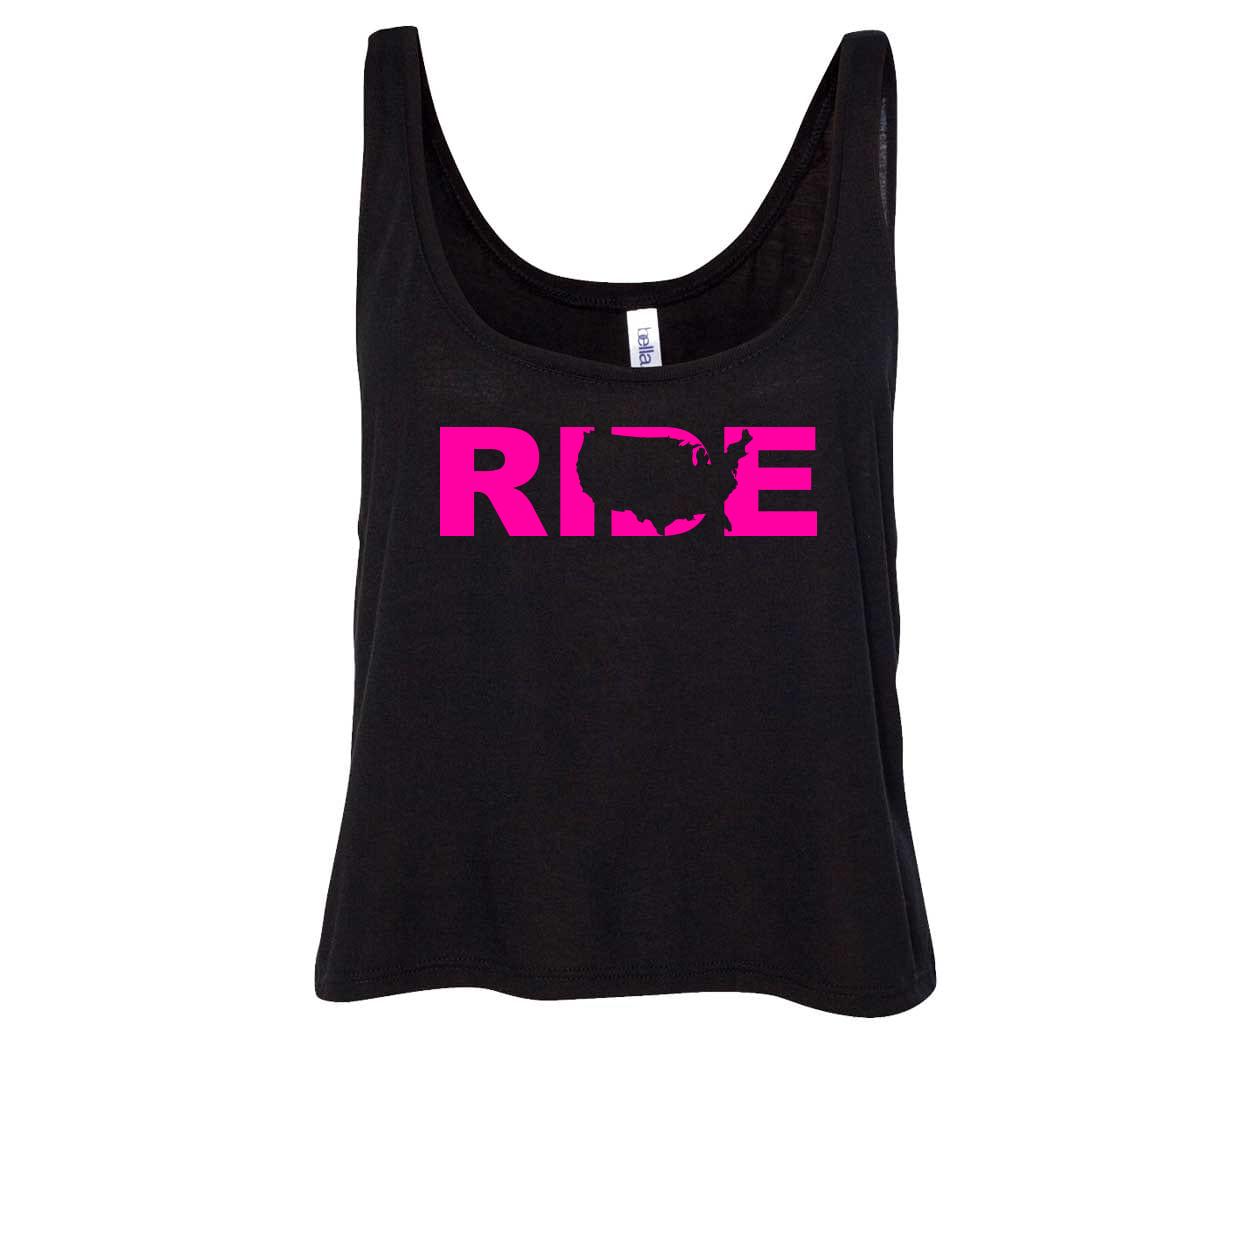 Ride United States Classic Womens Flowy Semi Cropped Tank Black (Pink Logo)